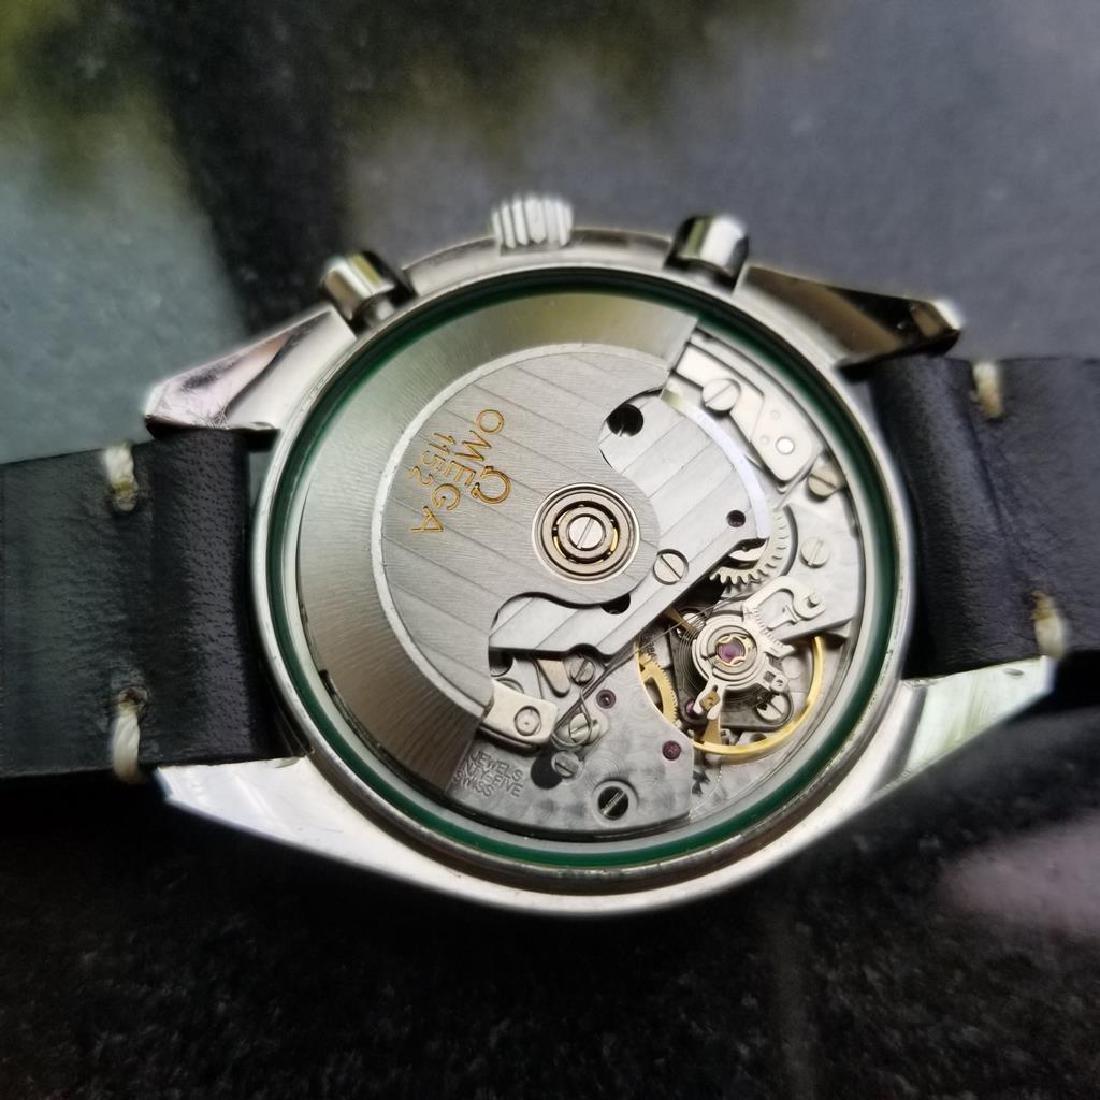 OMEGA Men's Speedmaster Automatic Chronograph 175.0083 - 8